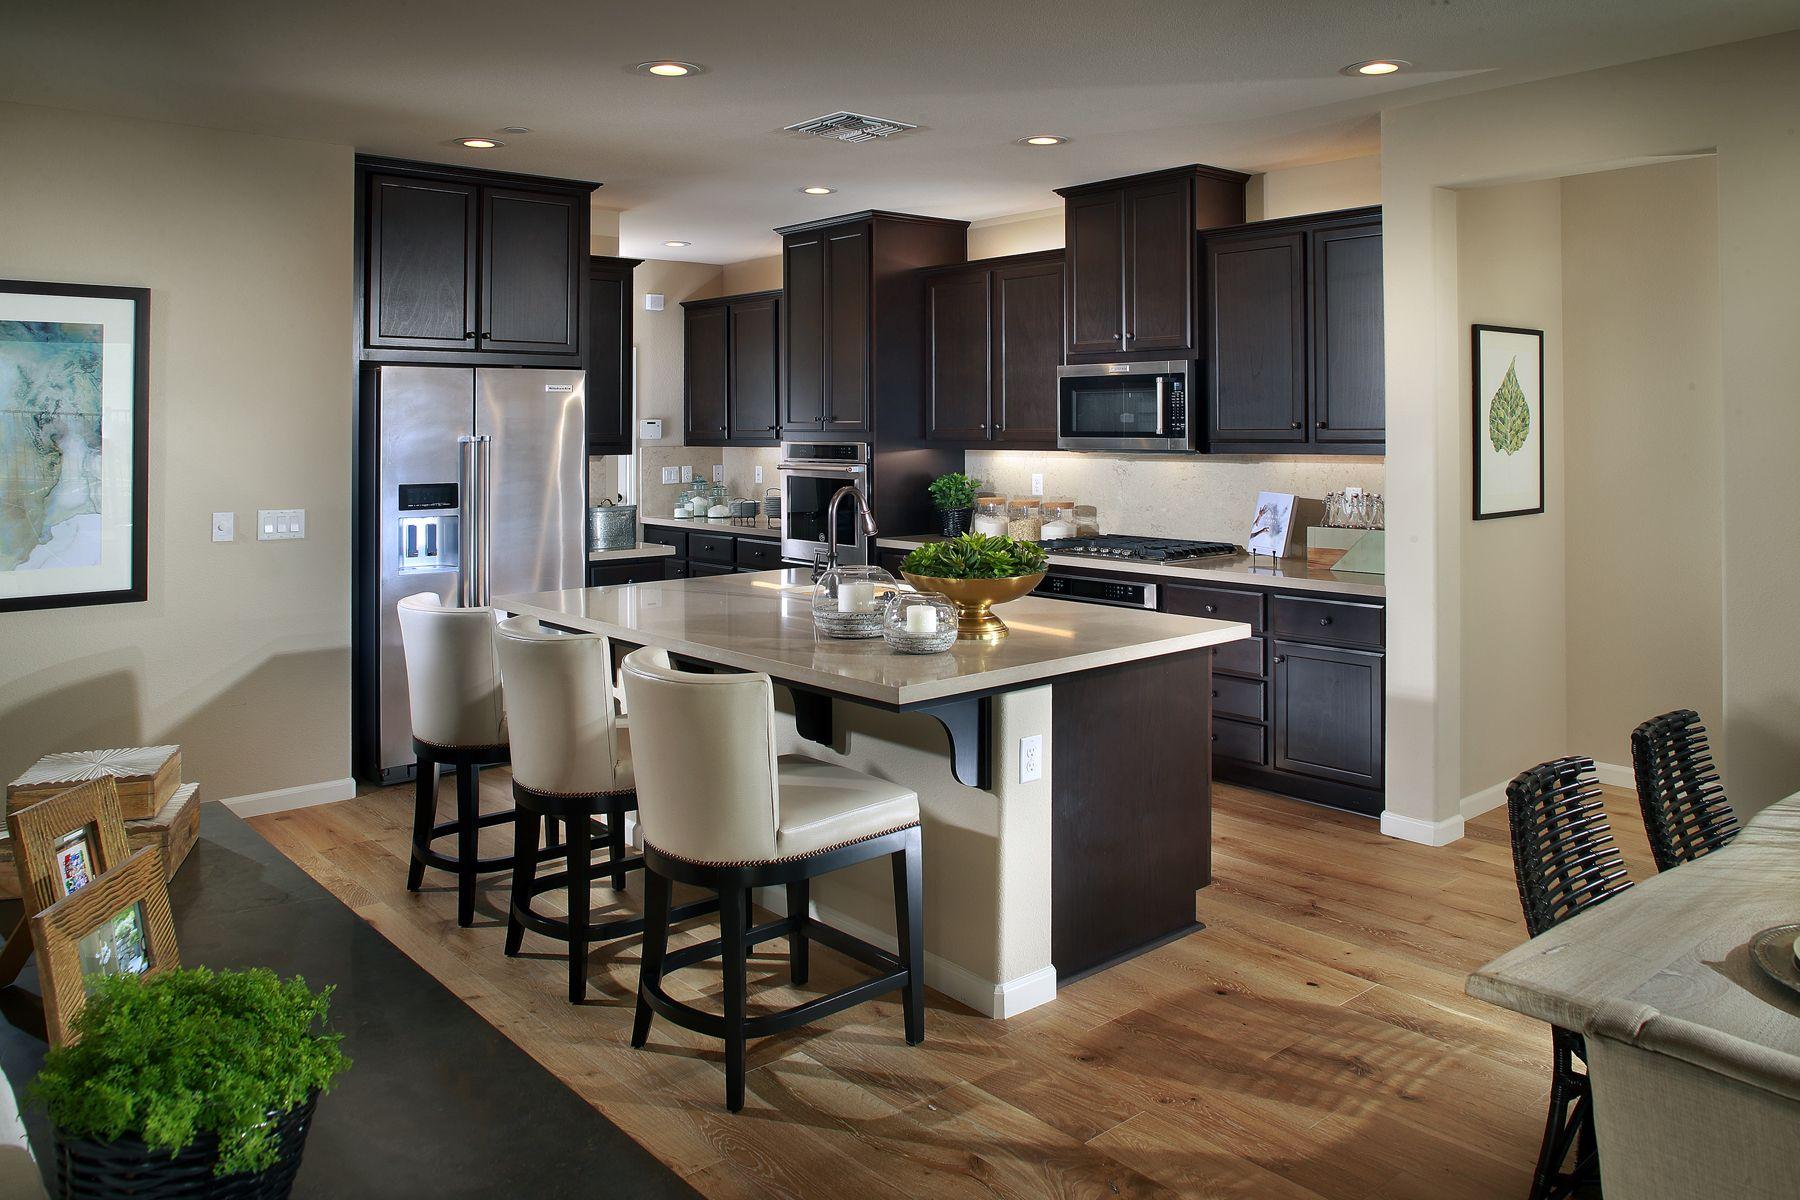 Residence Three Kitchen at Ironwood | New Neighborhood in Whitney ...